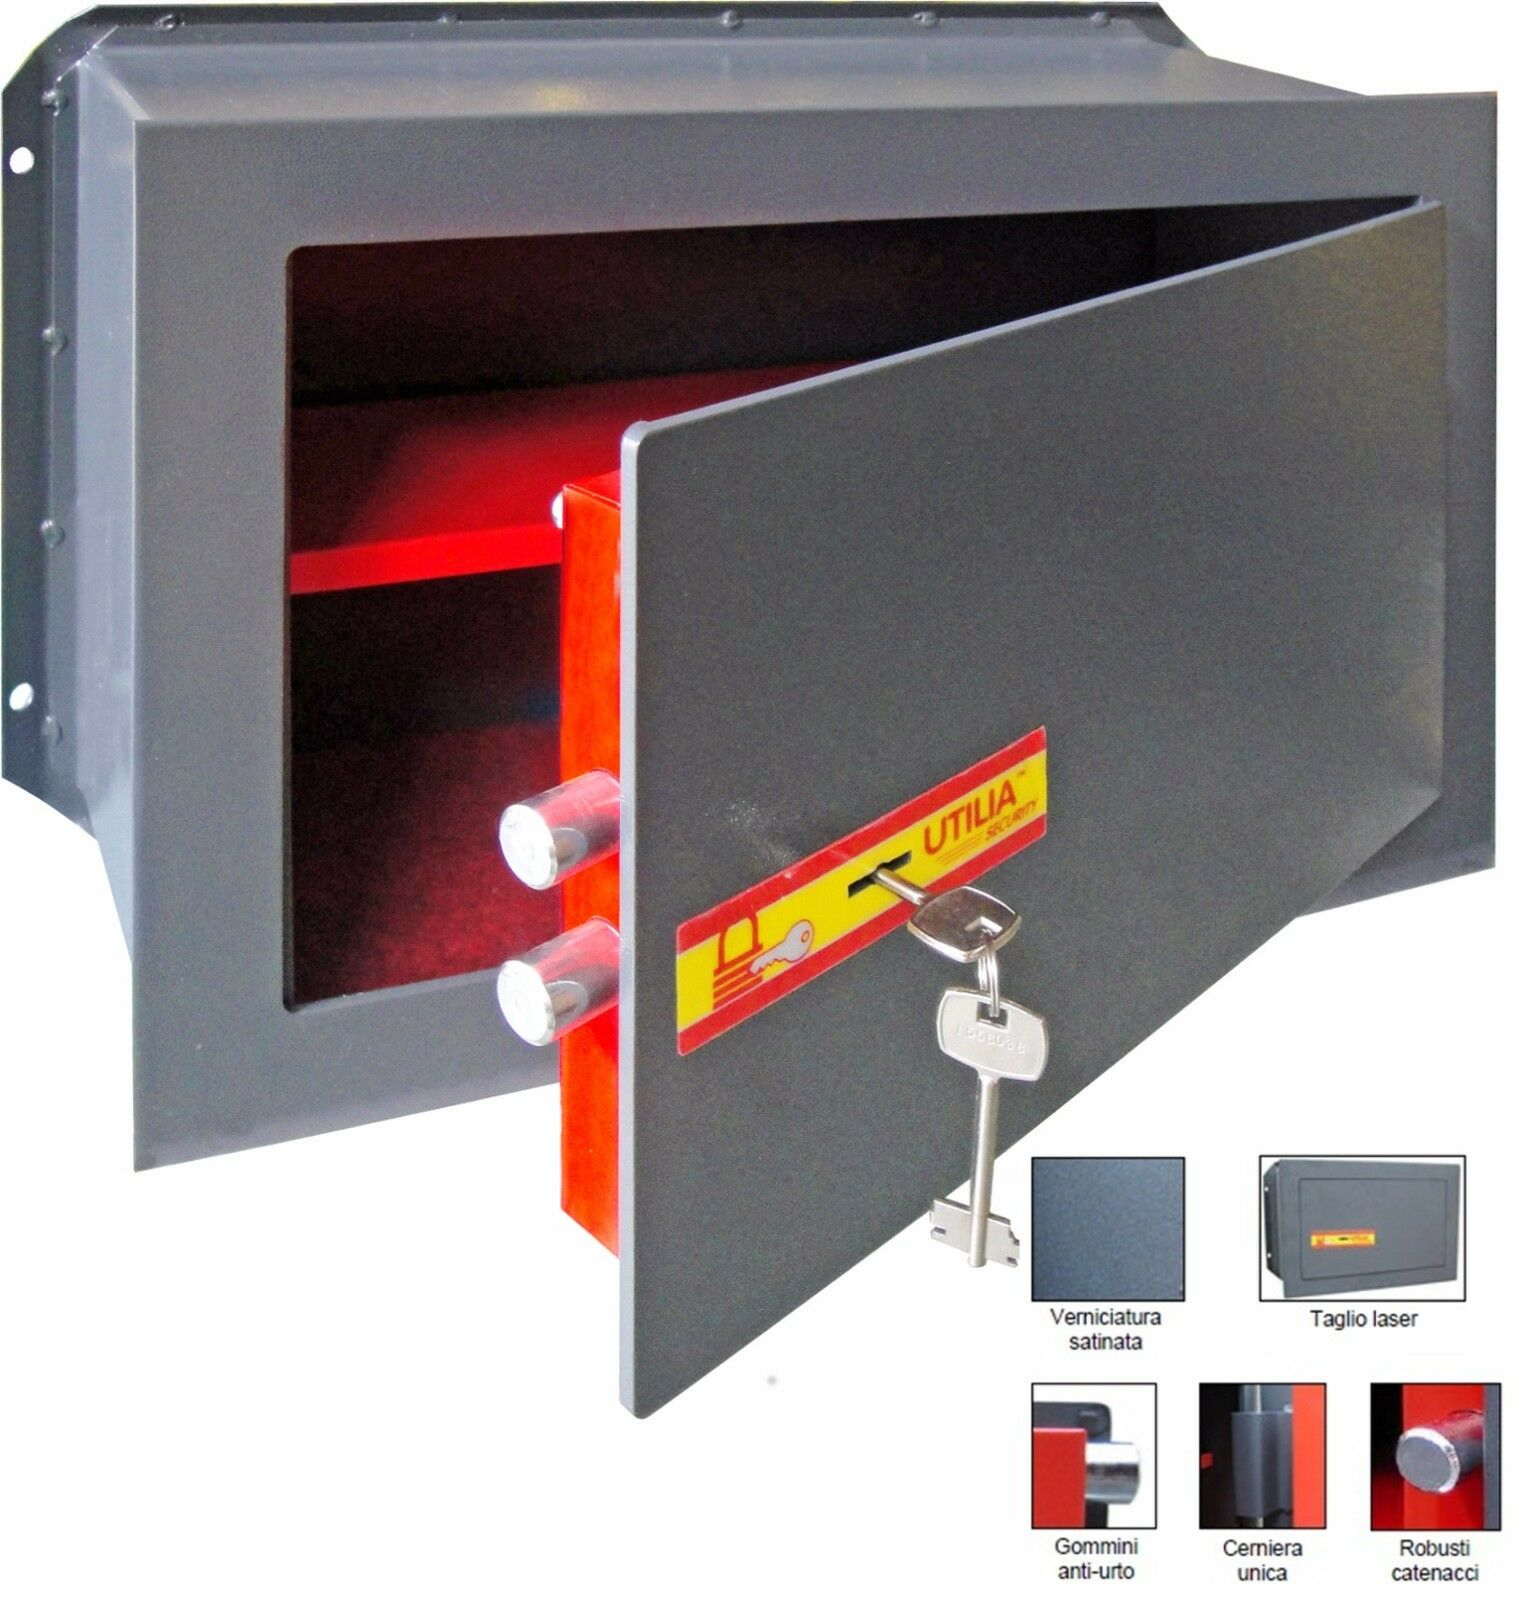 Cassaforte a muro Utilia Security acciaio con chiave 2 catenacci 2 mandate